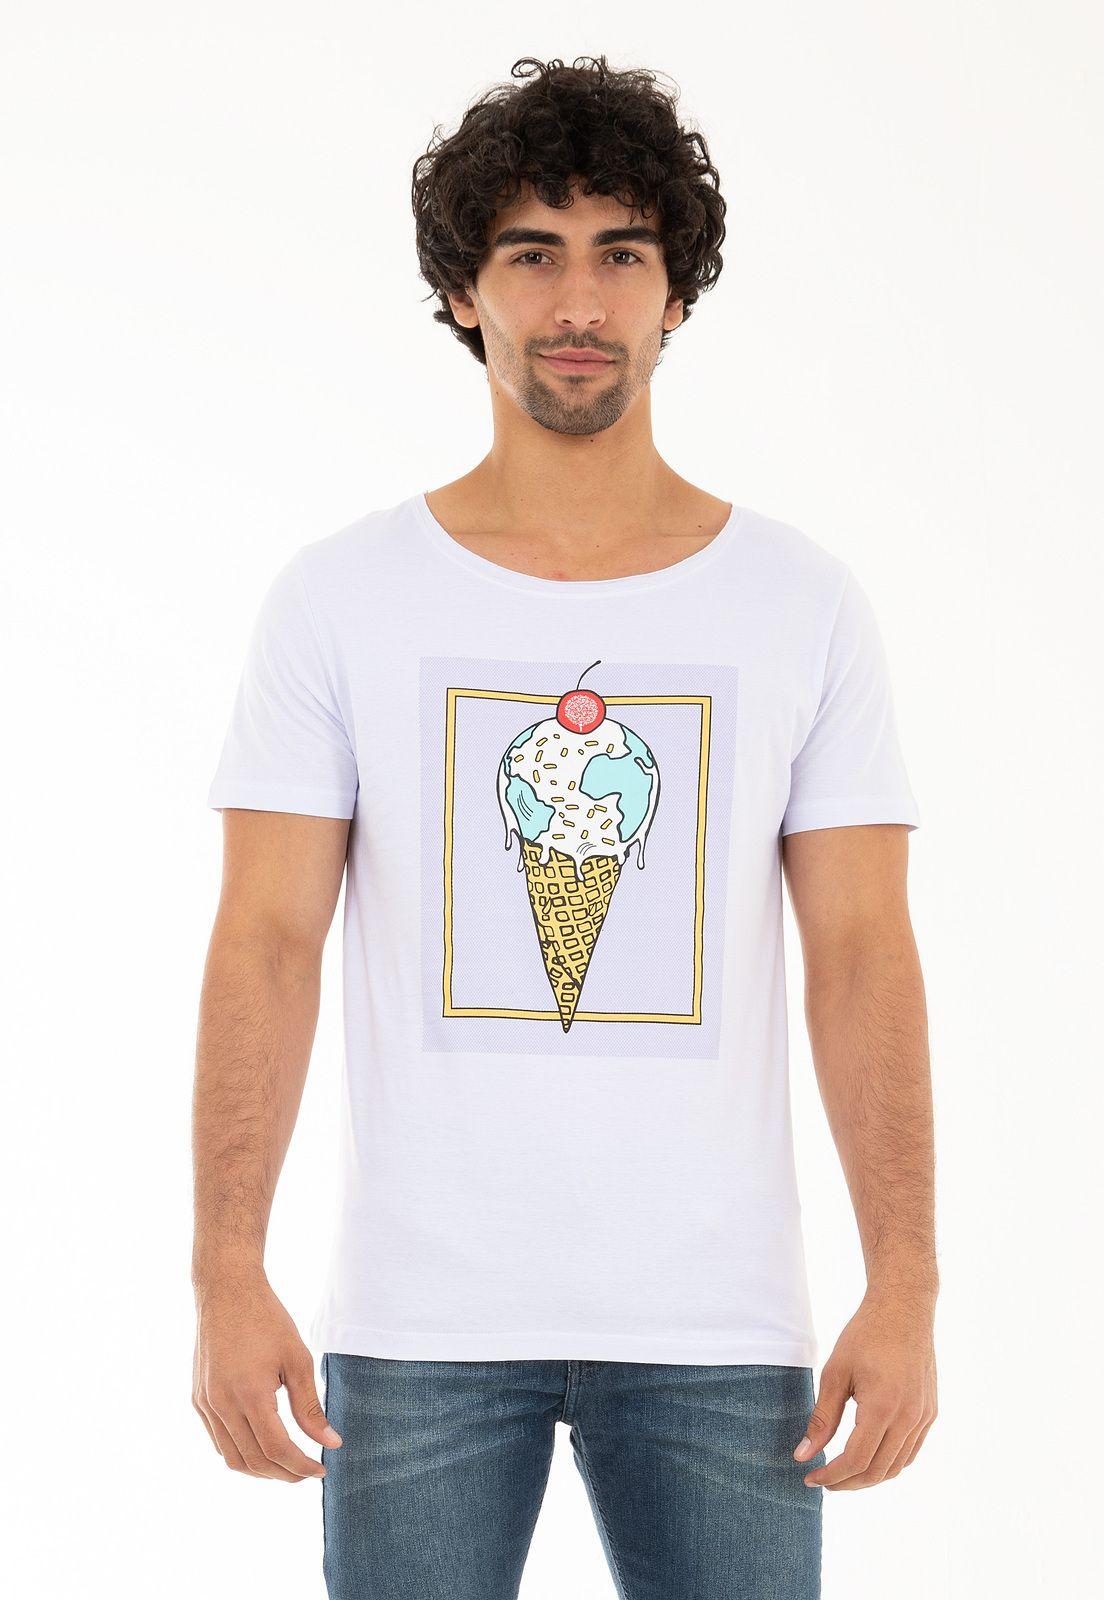 Camiseta Gola Canoa Sorvete Ice Globe KSA da árvore - Branca